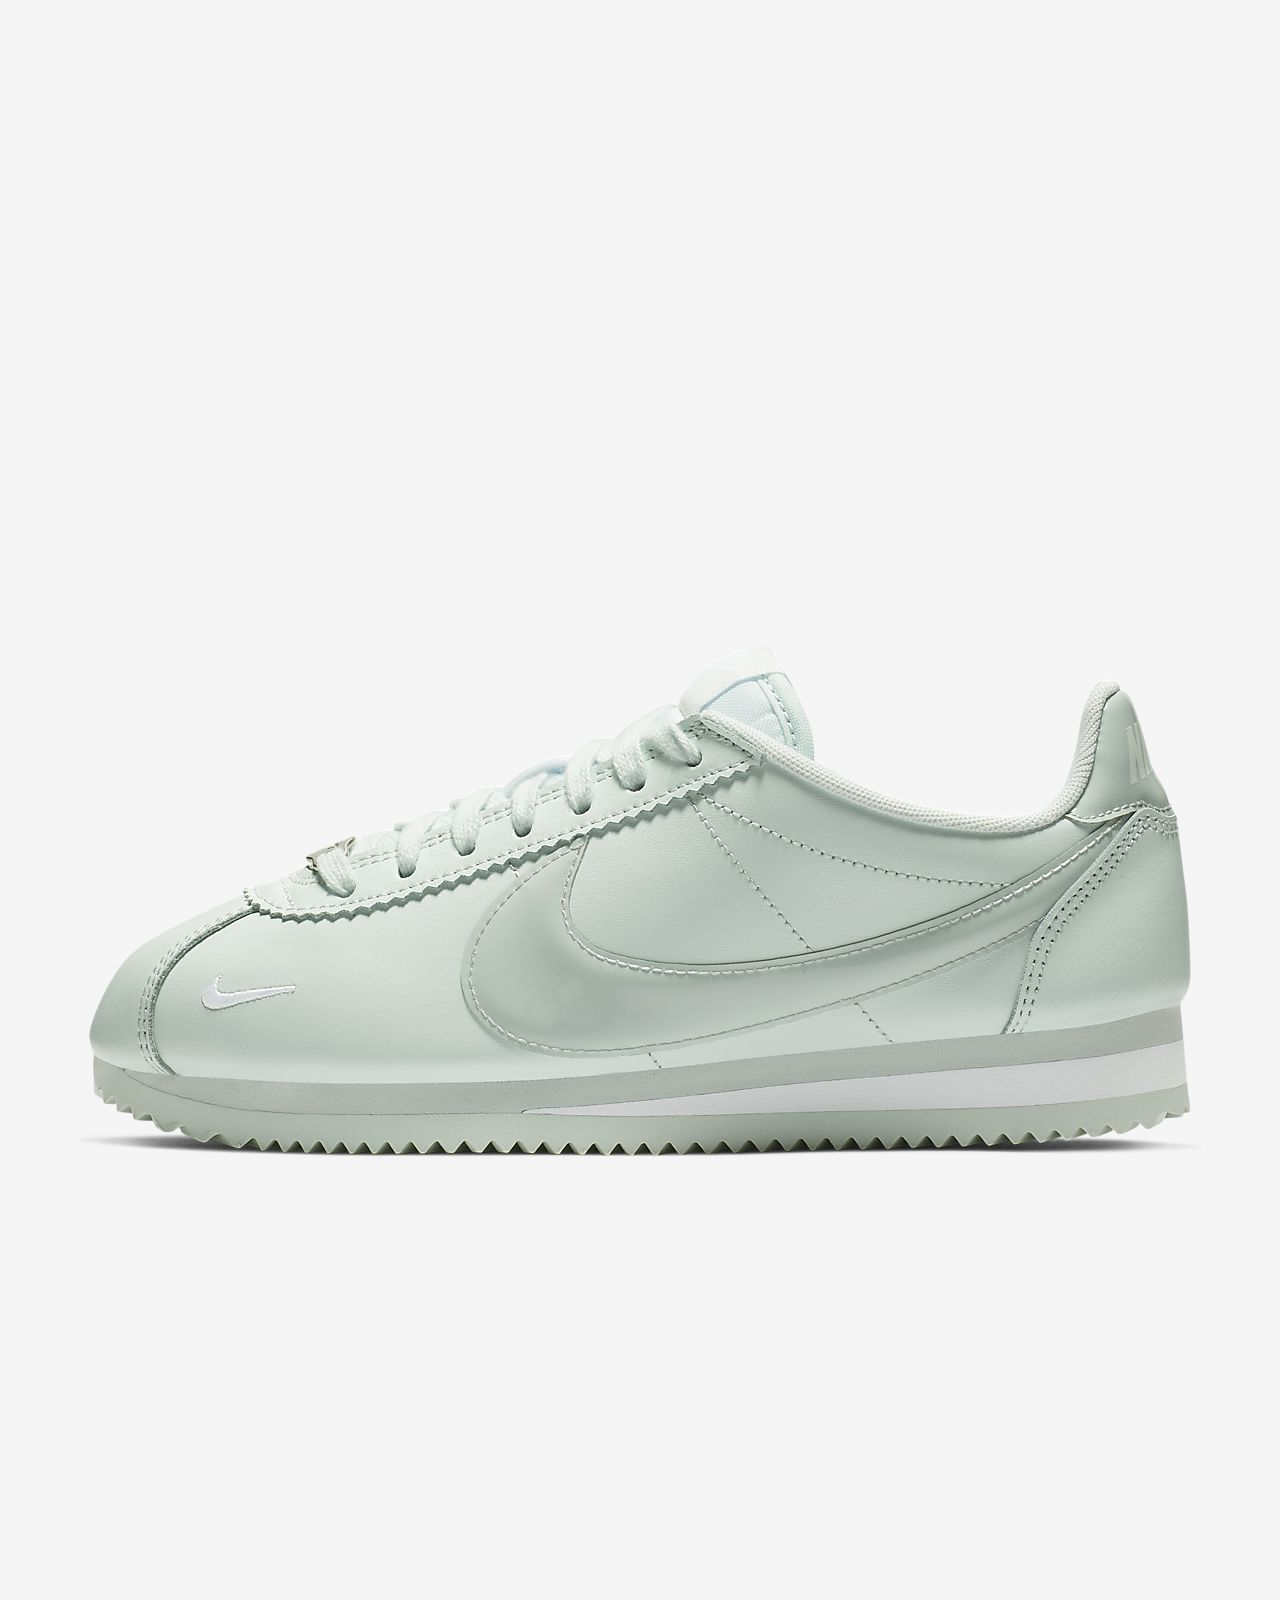 7ad493e31295 Nike Classic Cortez Premium Women s Shoe. Nike.com GB